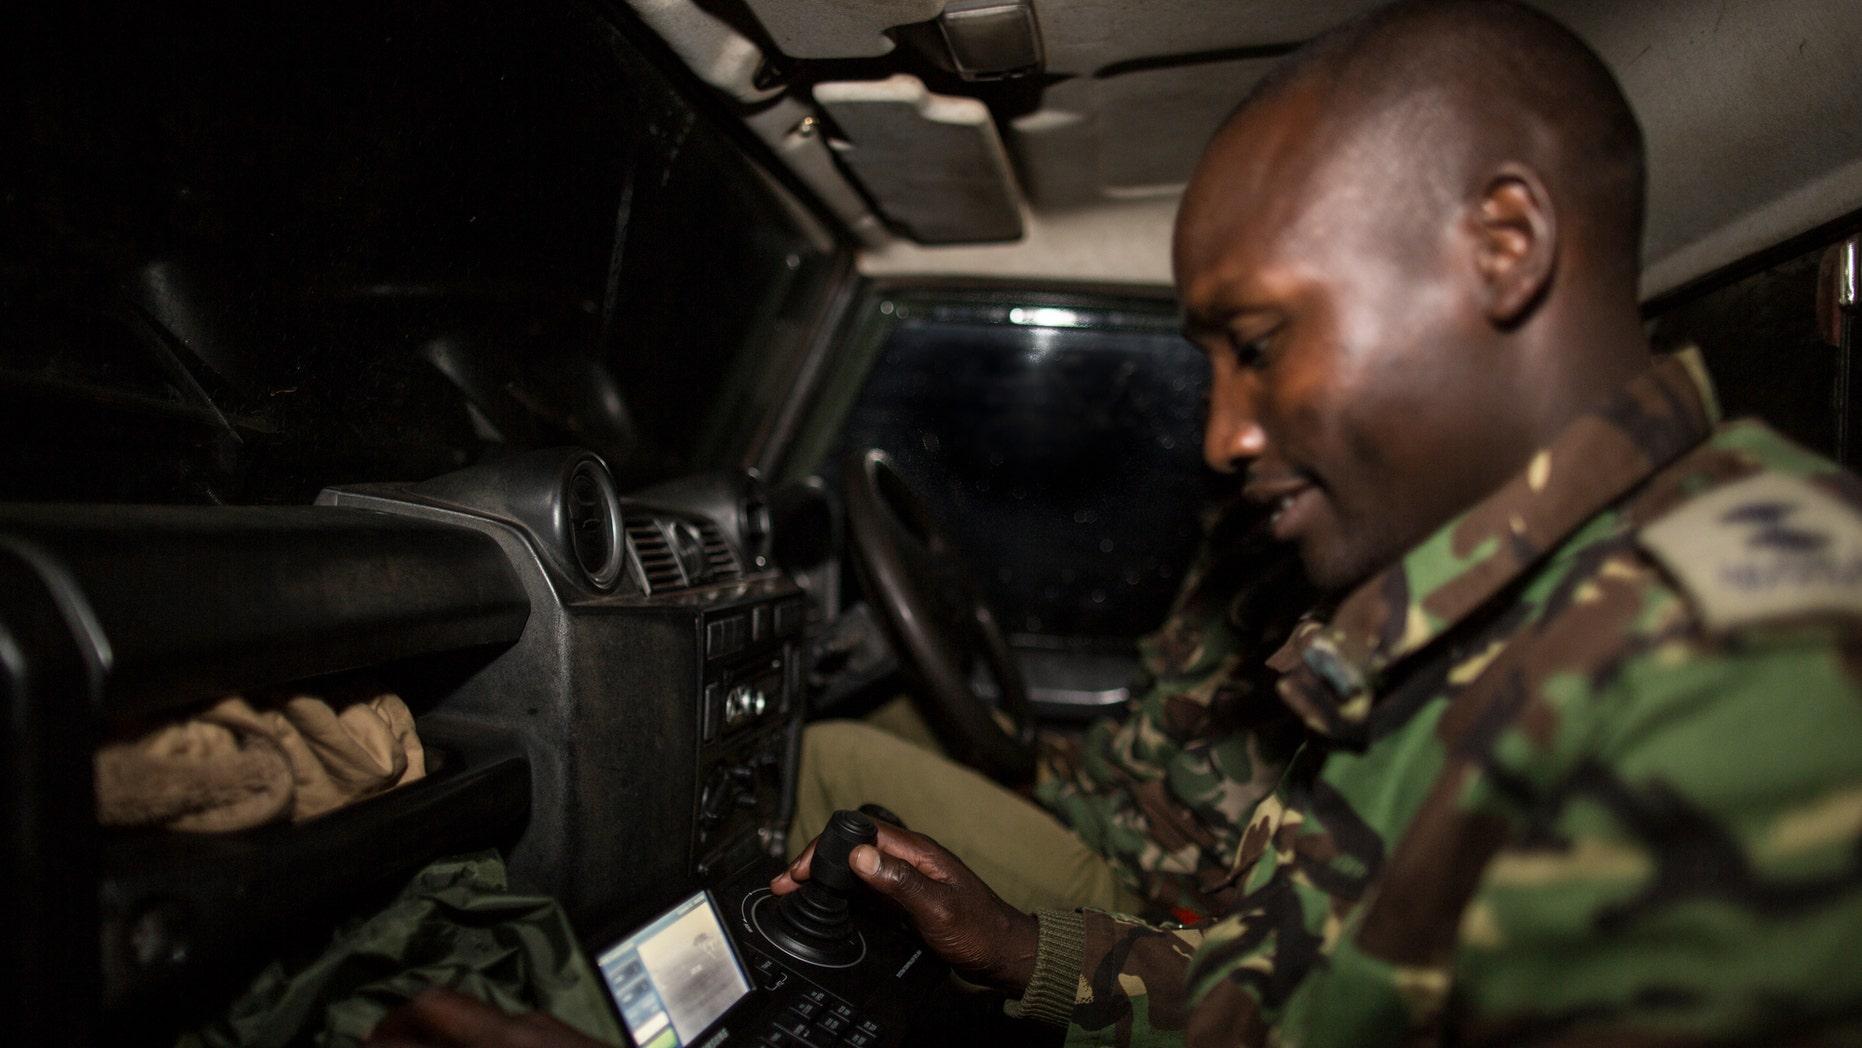 A ranger testing the new mobile FLIR camera unit at the Mara Conservancy at Maasai Mara National Reserve Kenya as part of WWF's Wildlife Crime Technology project (World Wildlife Fund).